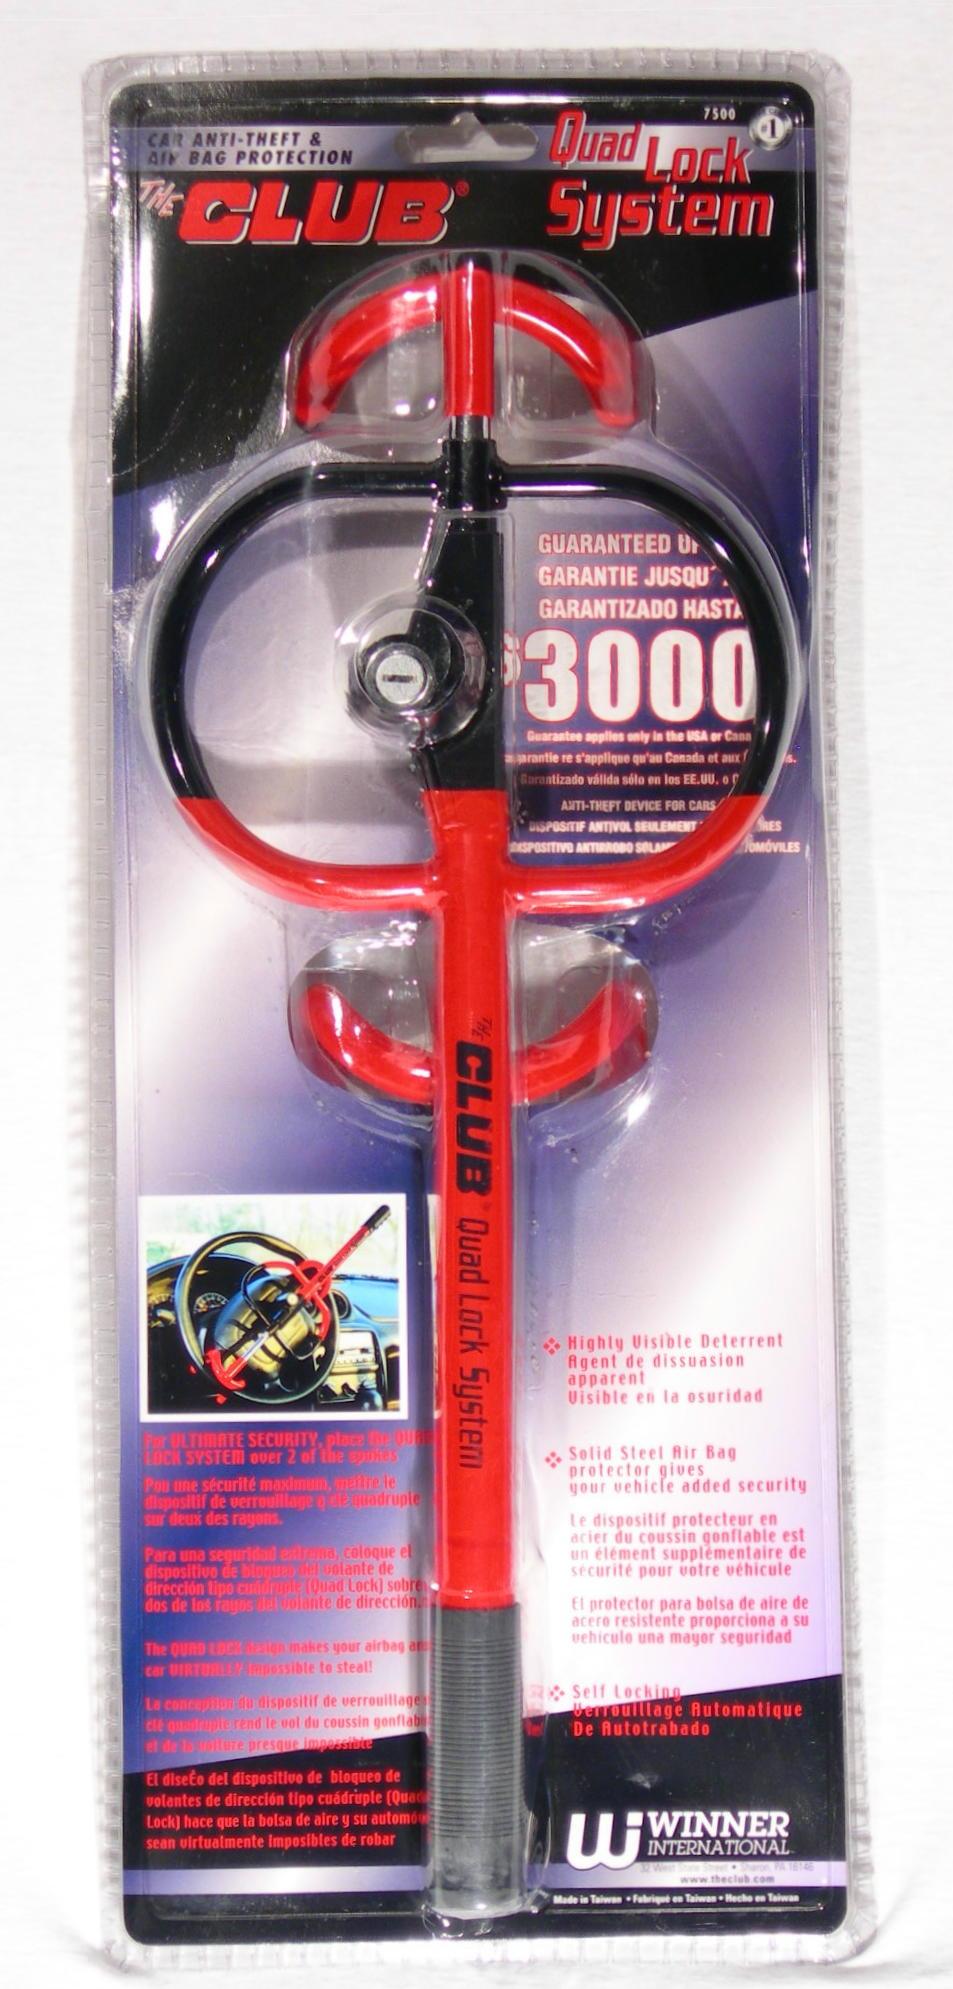 Image of Winner International 7500 Club Quad System Lock